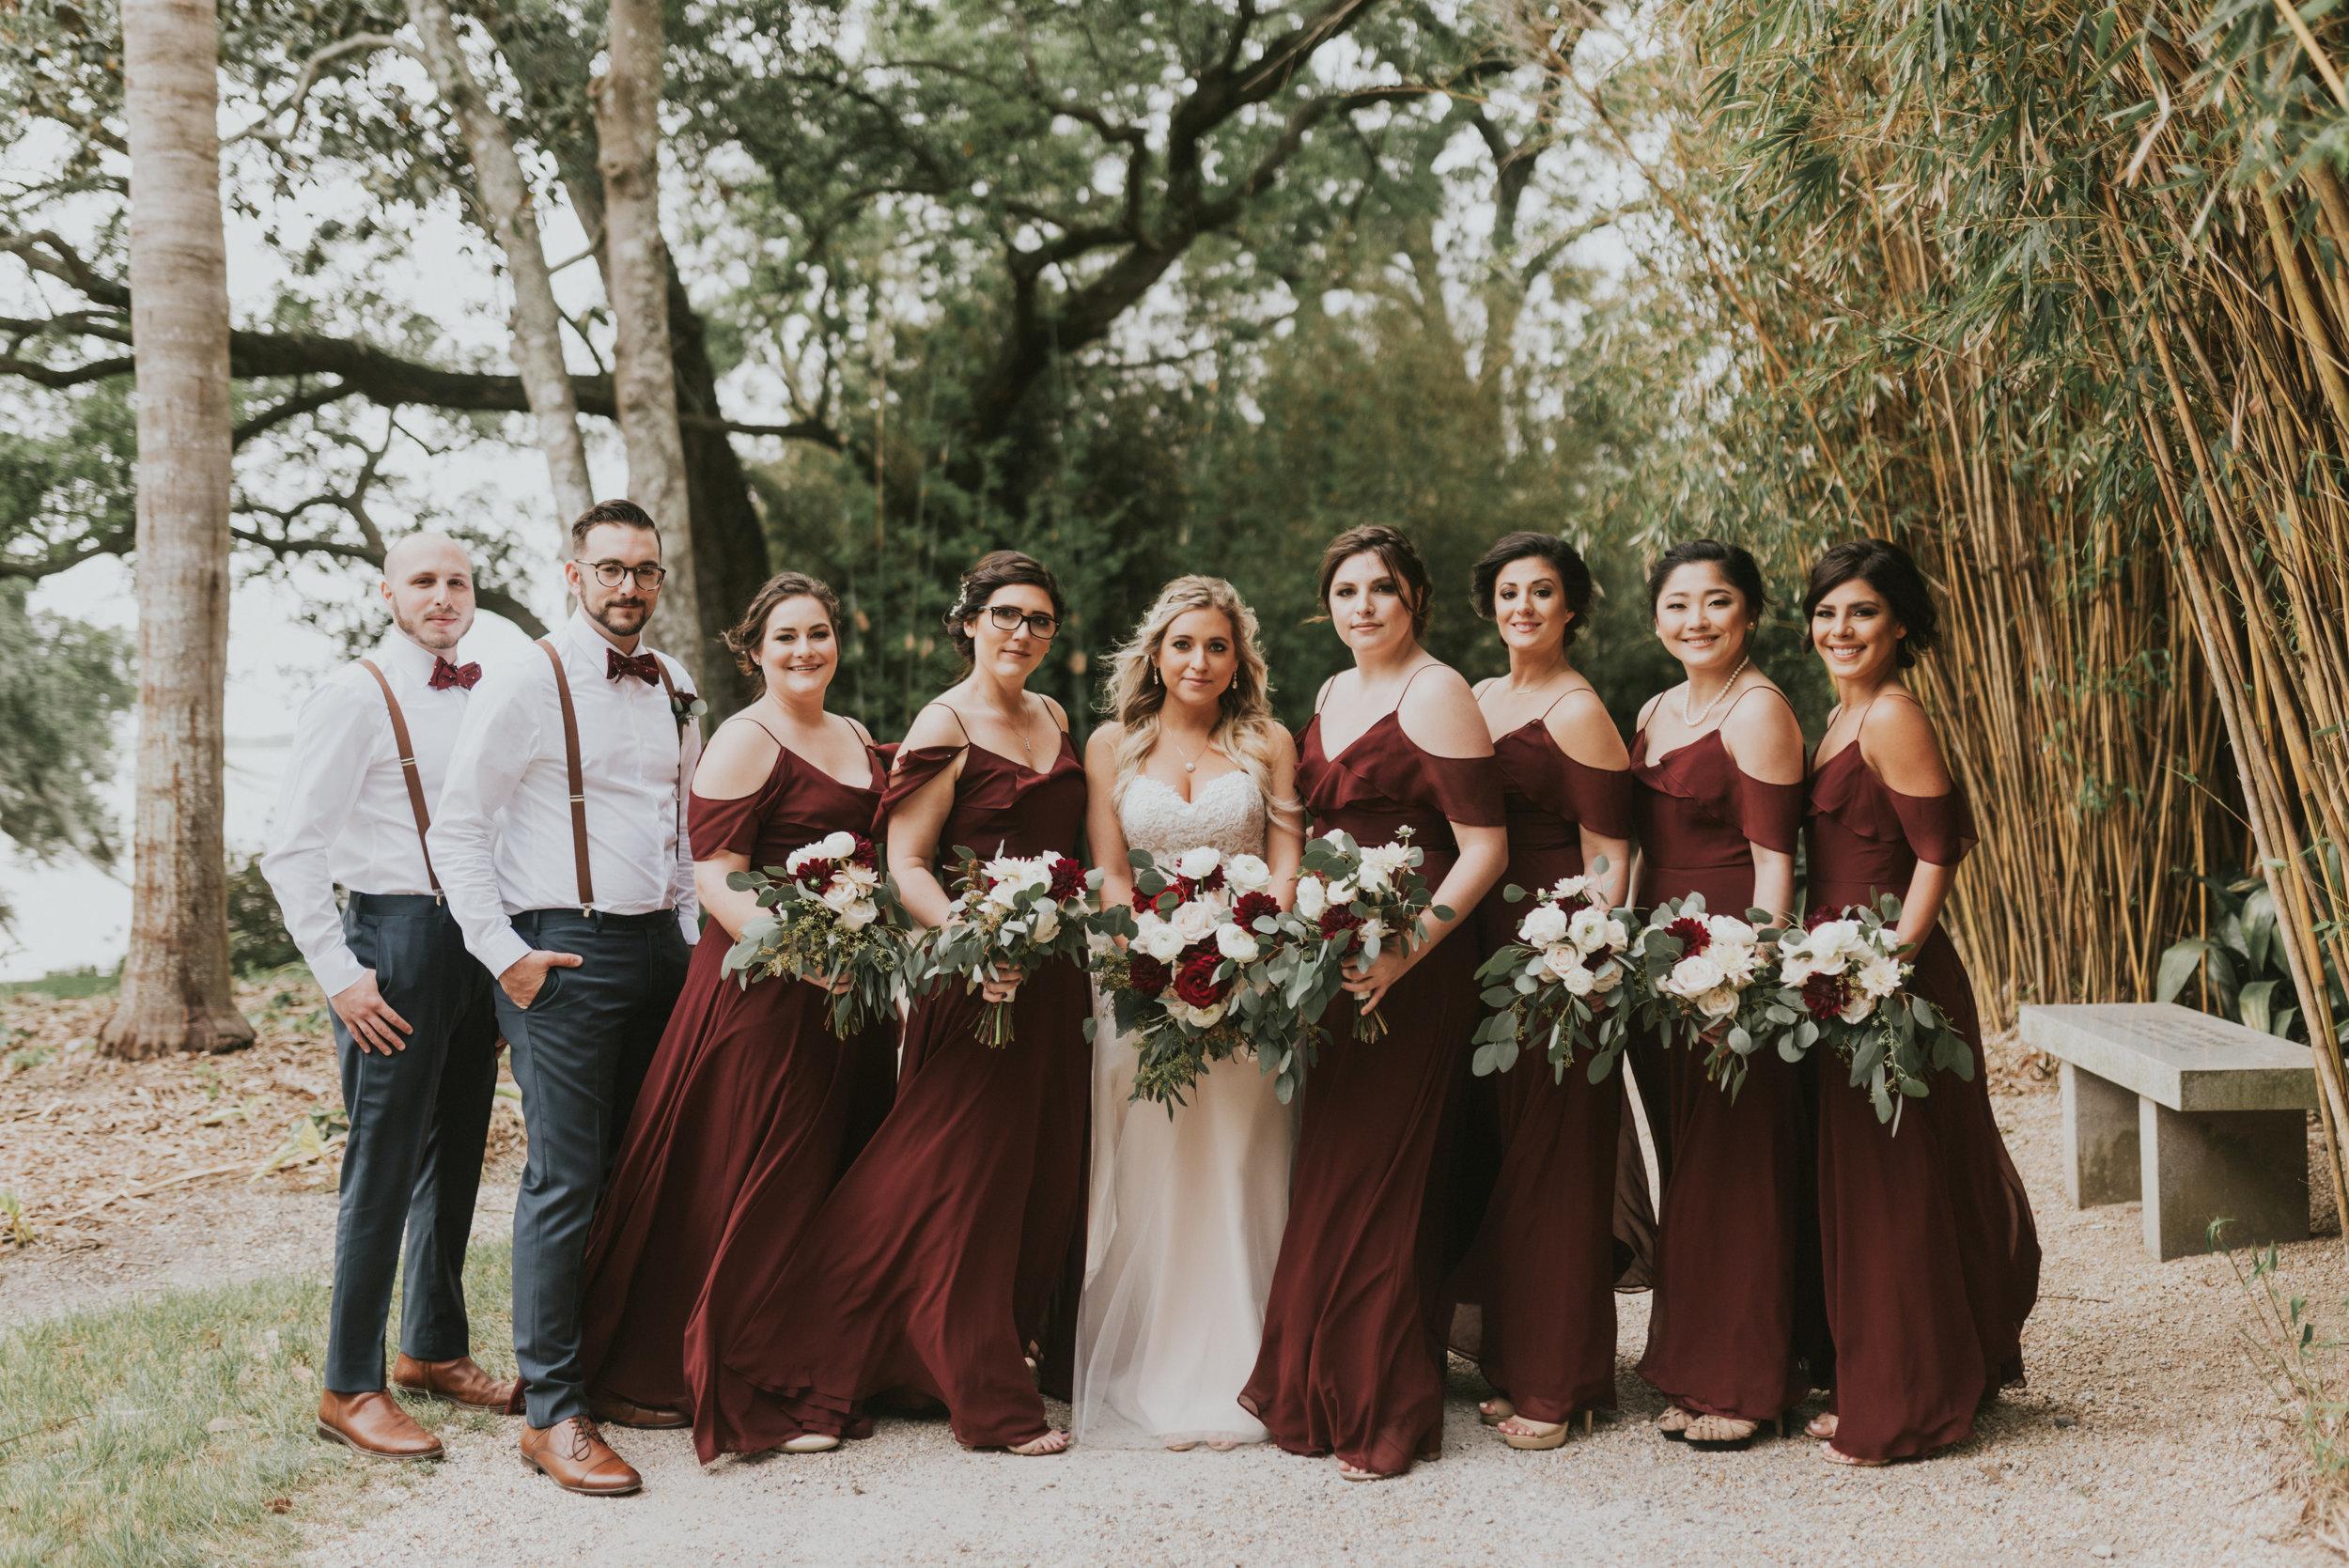 Southern Fete, Southern Wedding, Bridal Party, Maroon Bridesmaids dresses, Jen Menard Photo